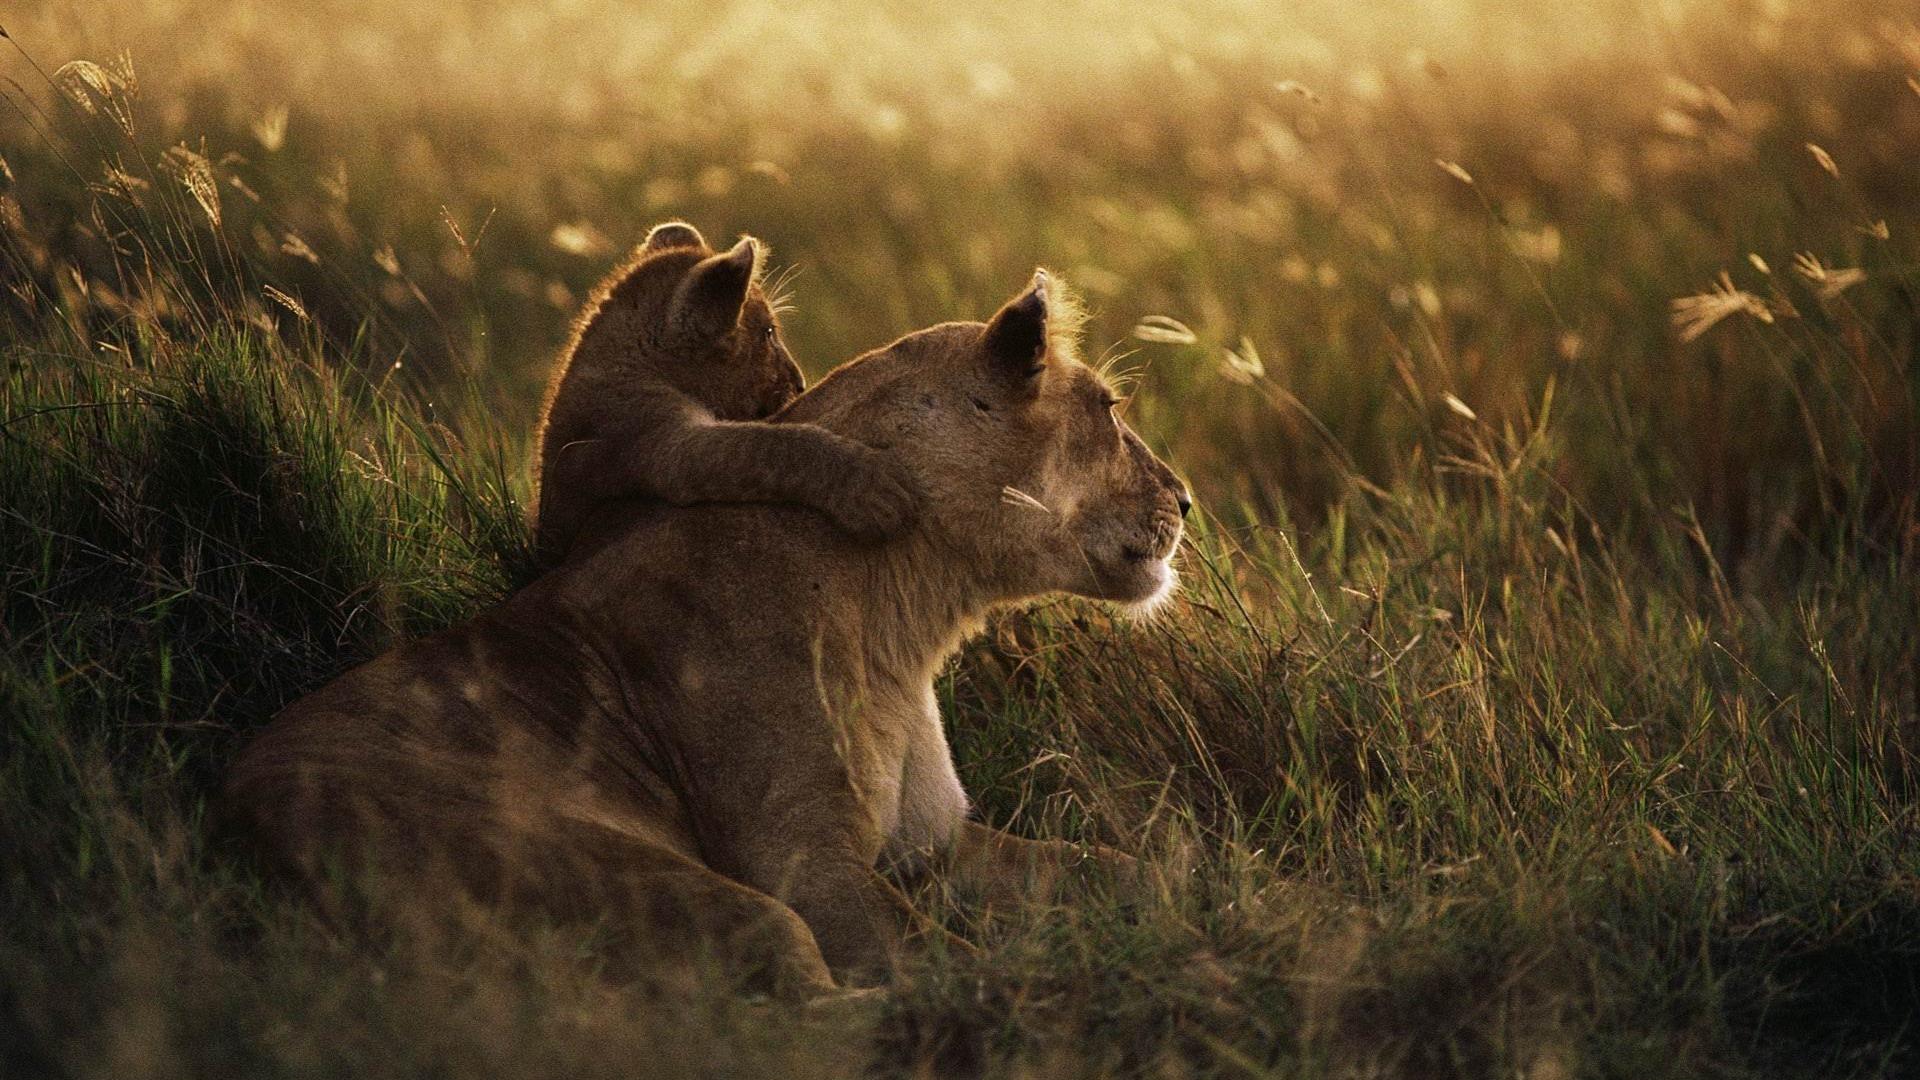 african lion Animal wallpaper HD Wallpaper Background Photo 1920x1080